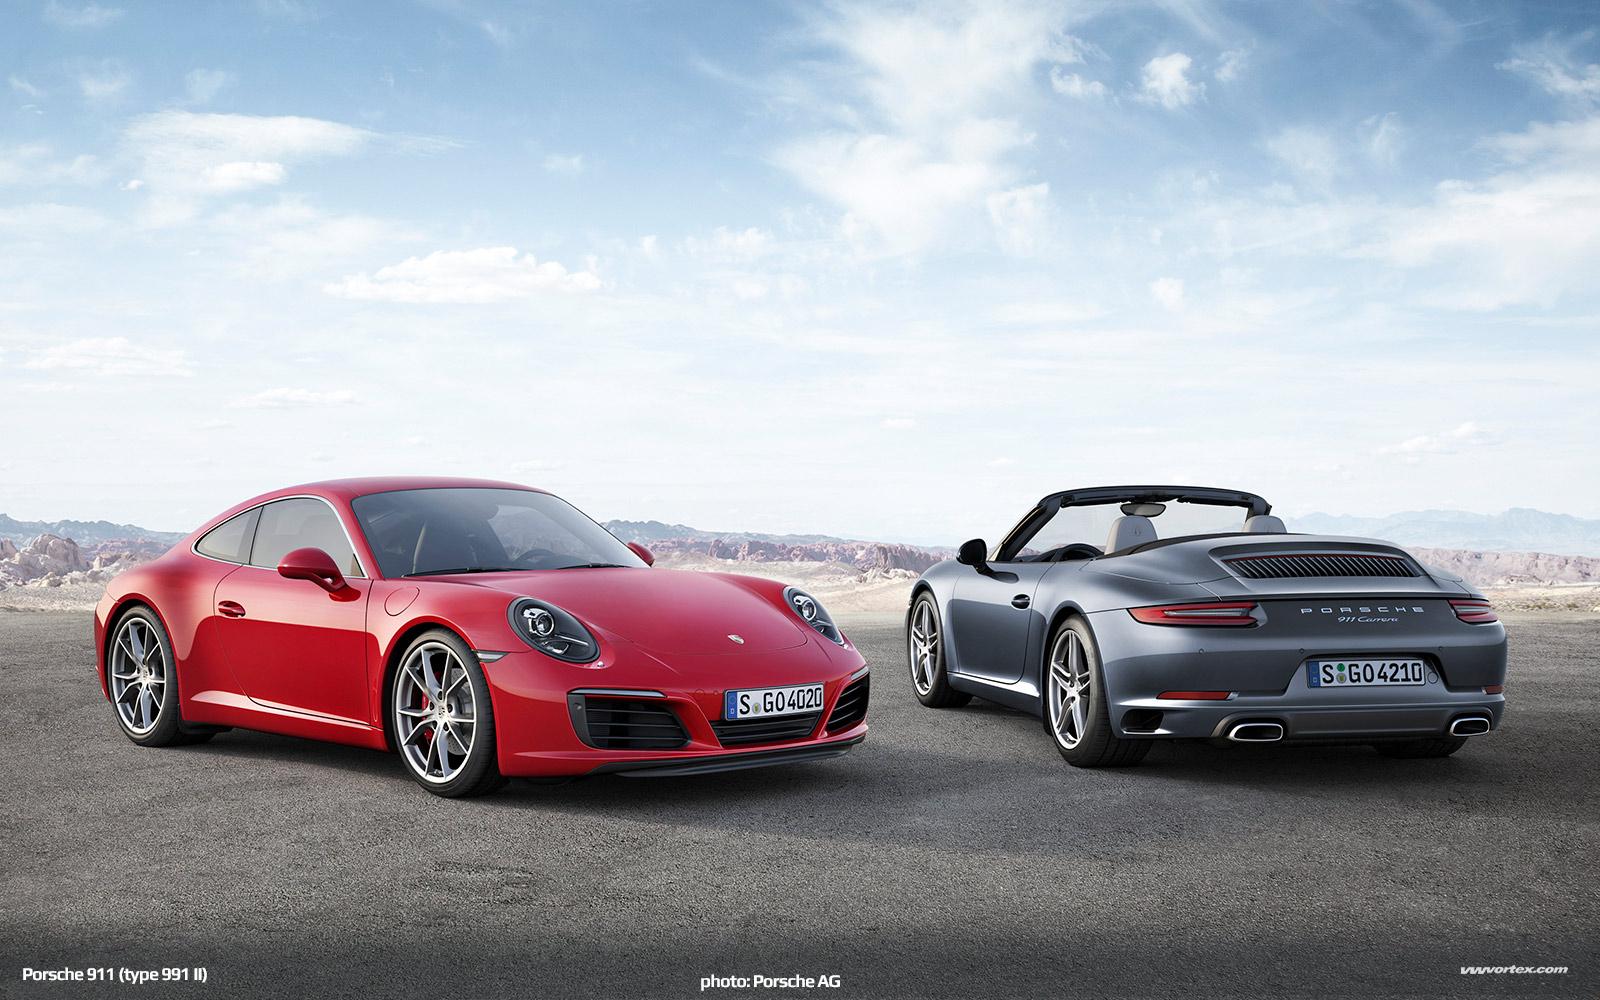 Porsche-911-991-ii-2016-506